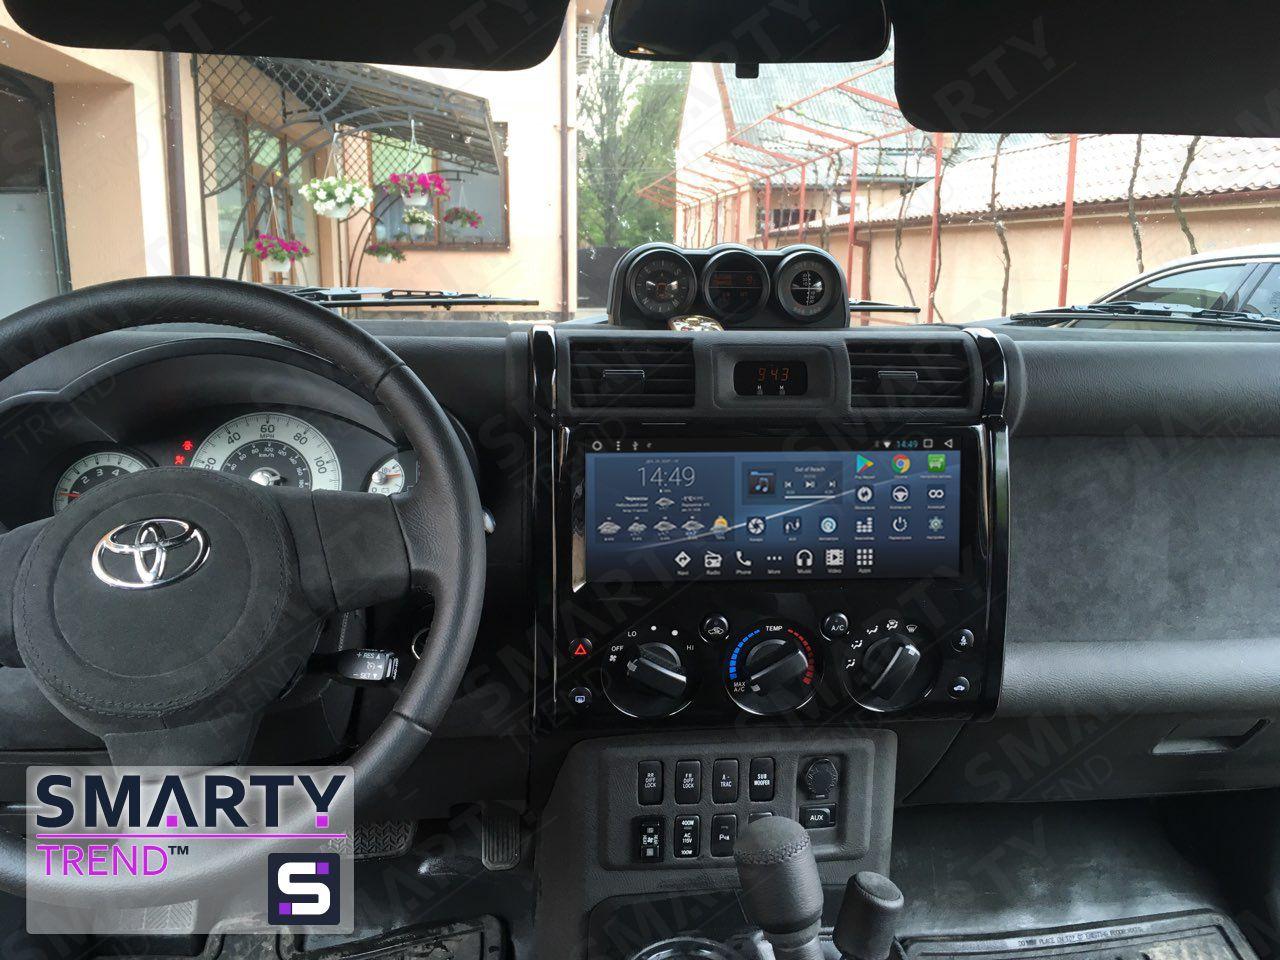 Toyota Fj Cruiser Android Car Stereo Navigation In Dash Head Unit In 2020 Fj Cruiser Toyota Fj Cruiser Fj Cruiser Mods